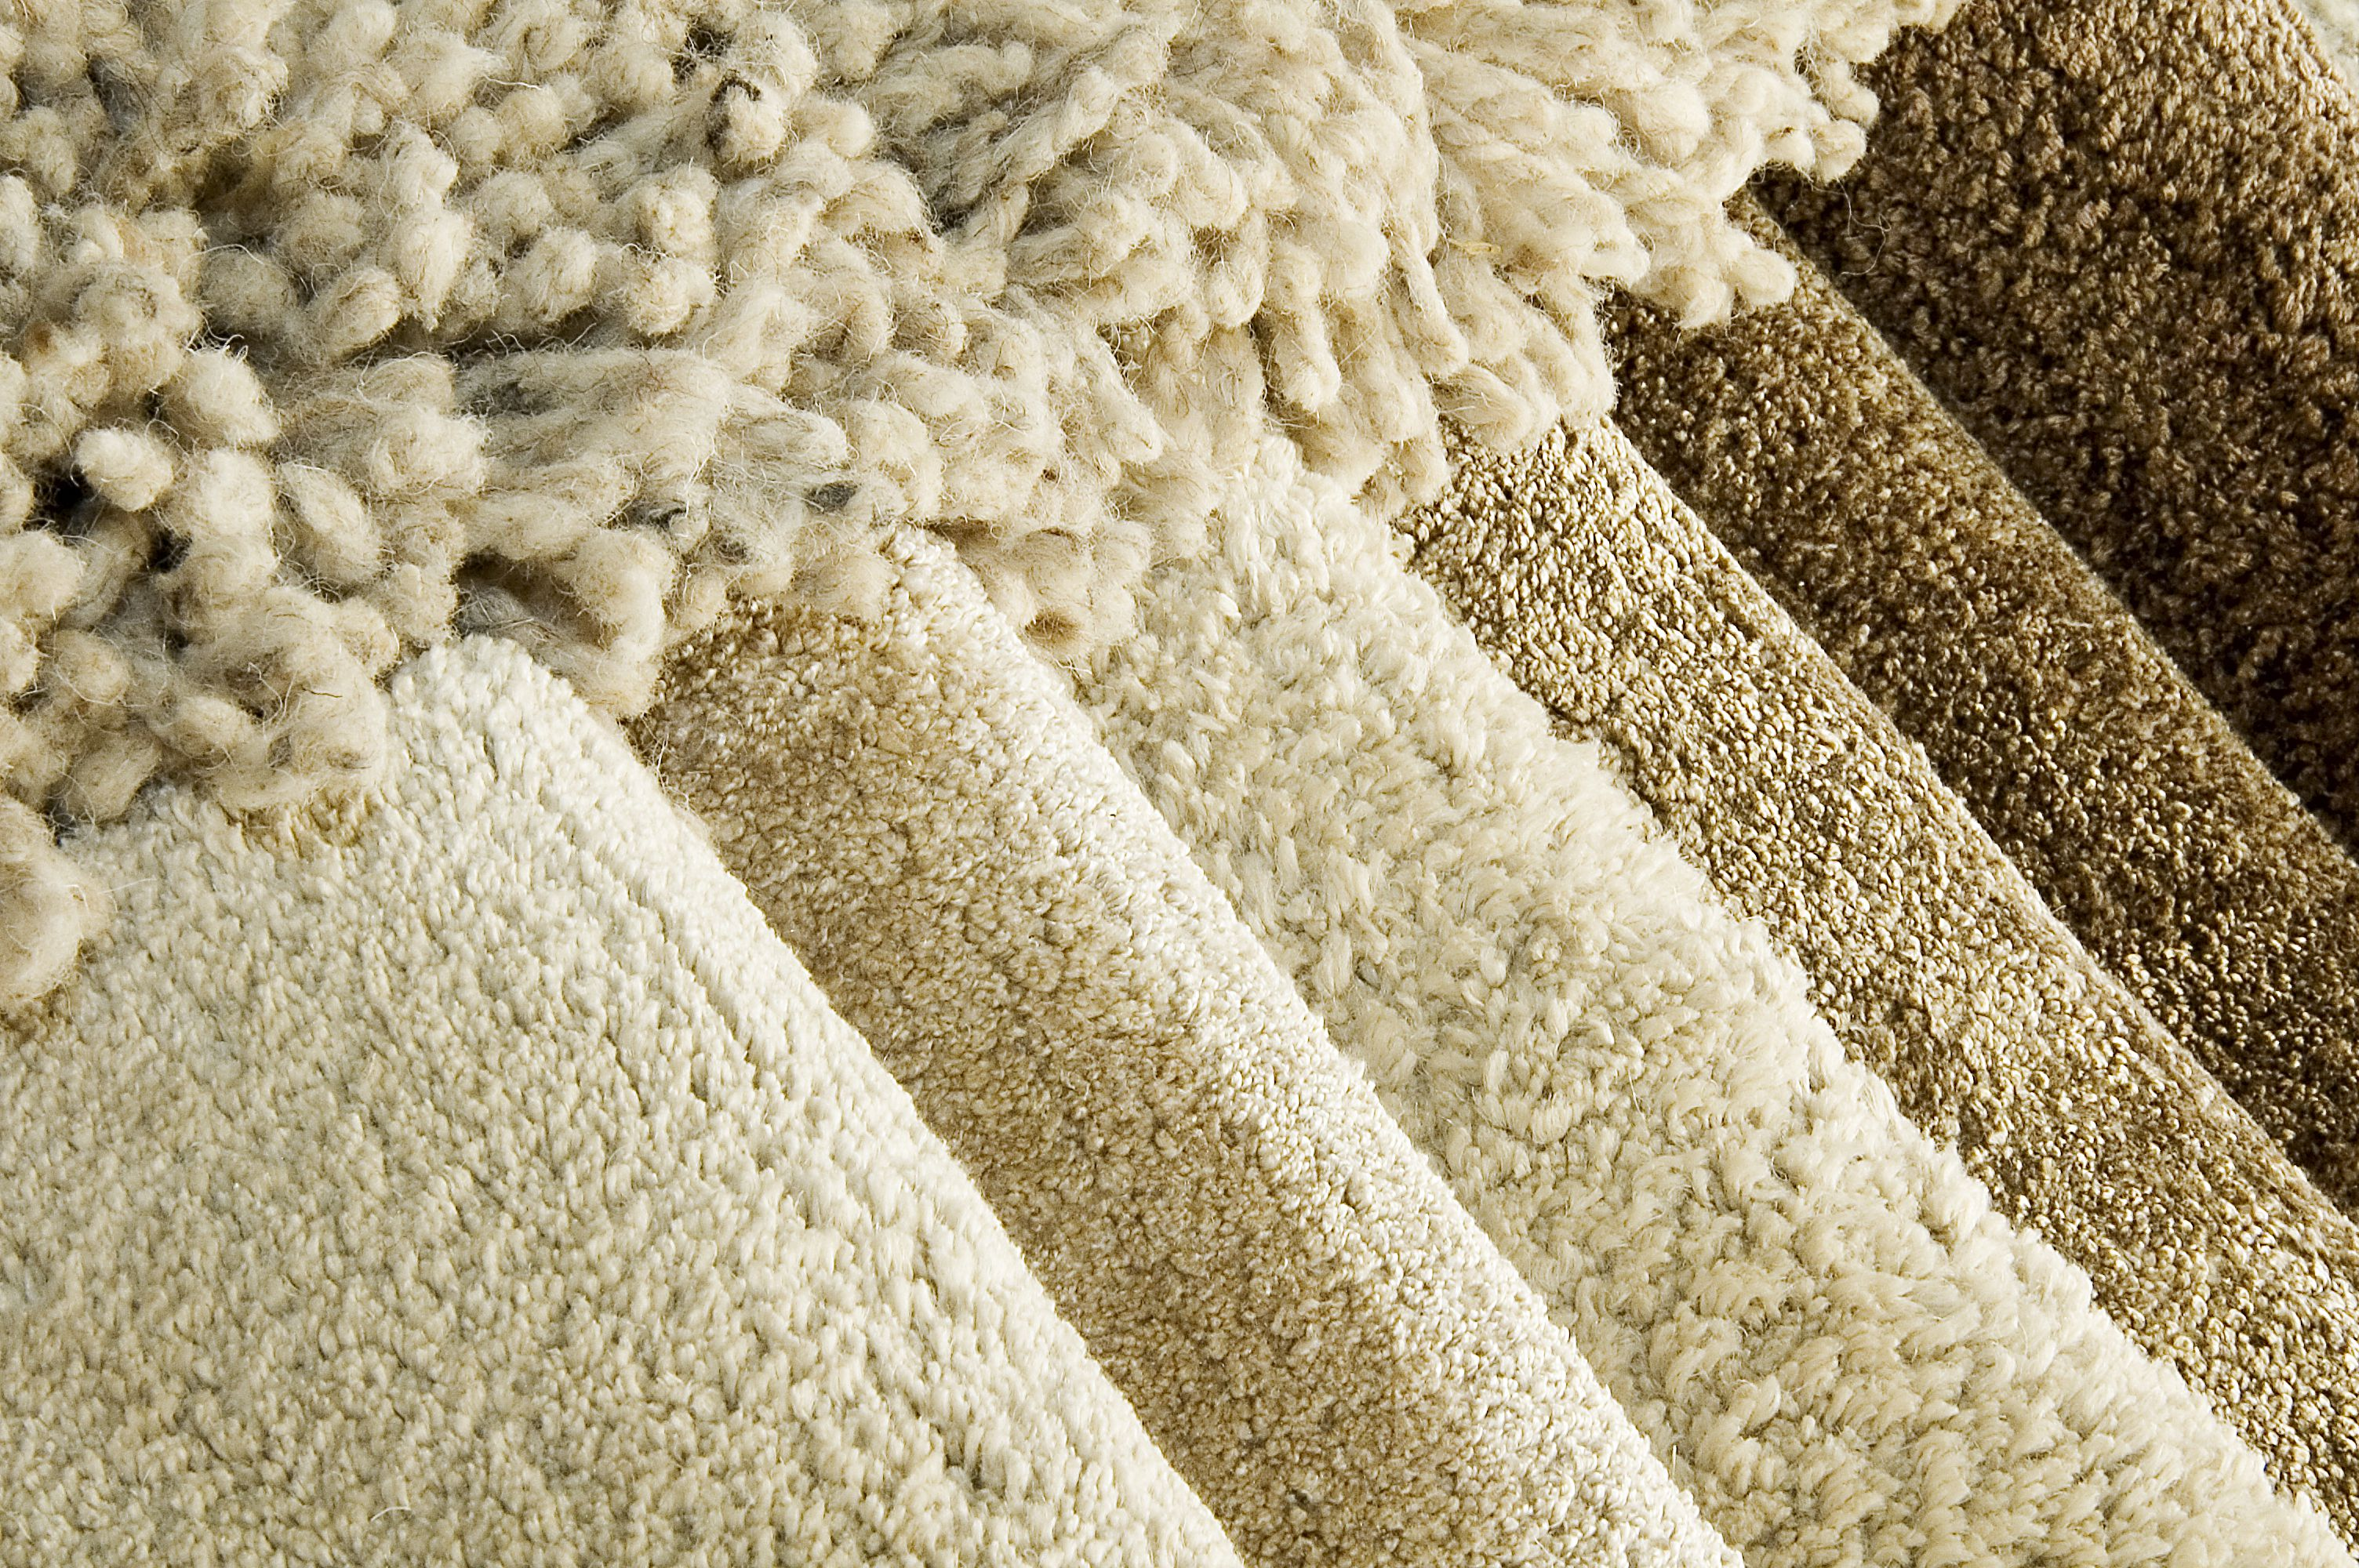 EcoFriendly Natural Fiber Carpet Choices